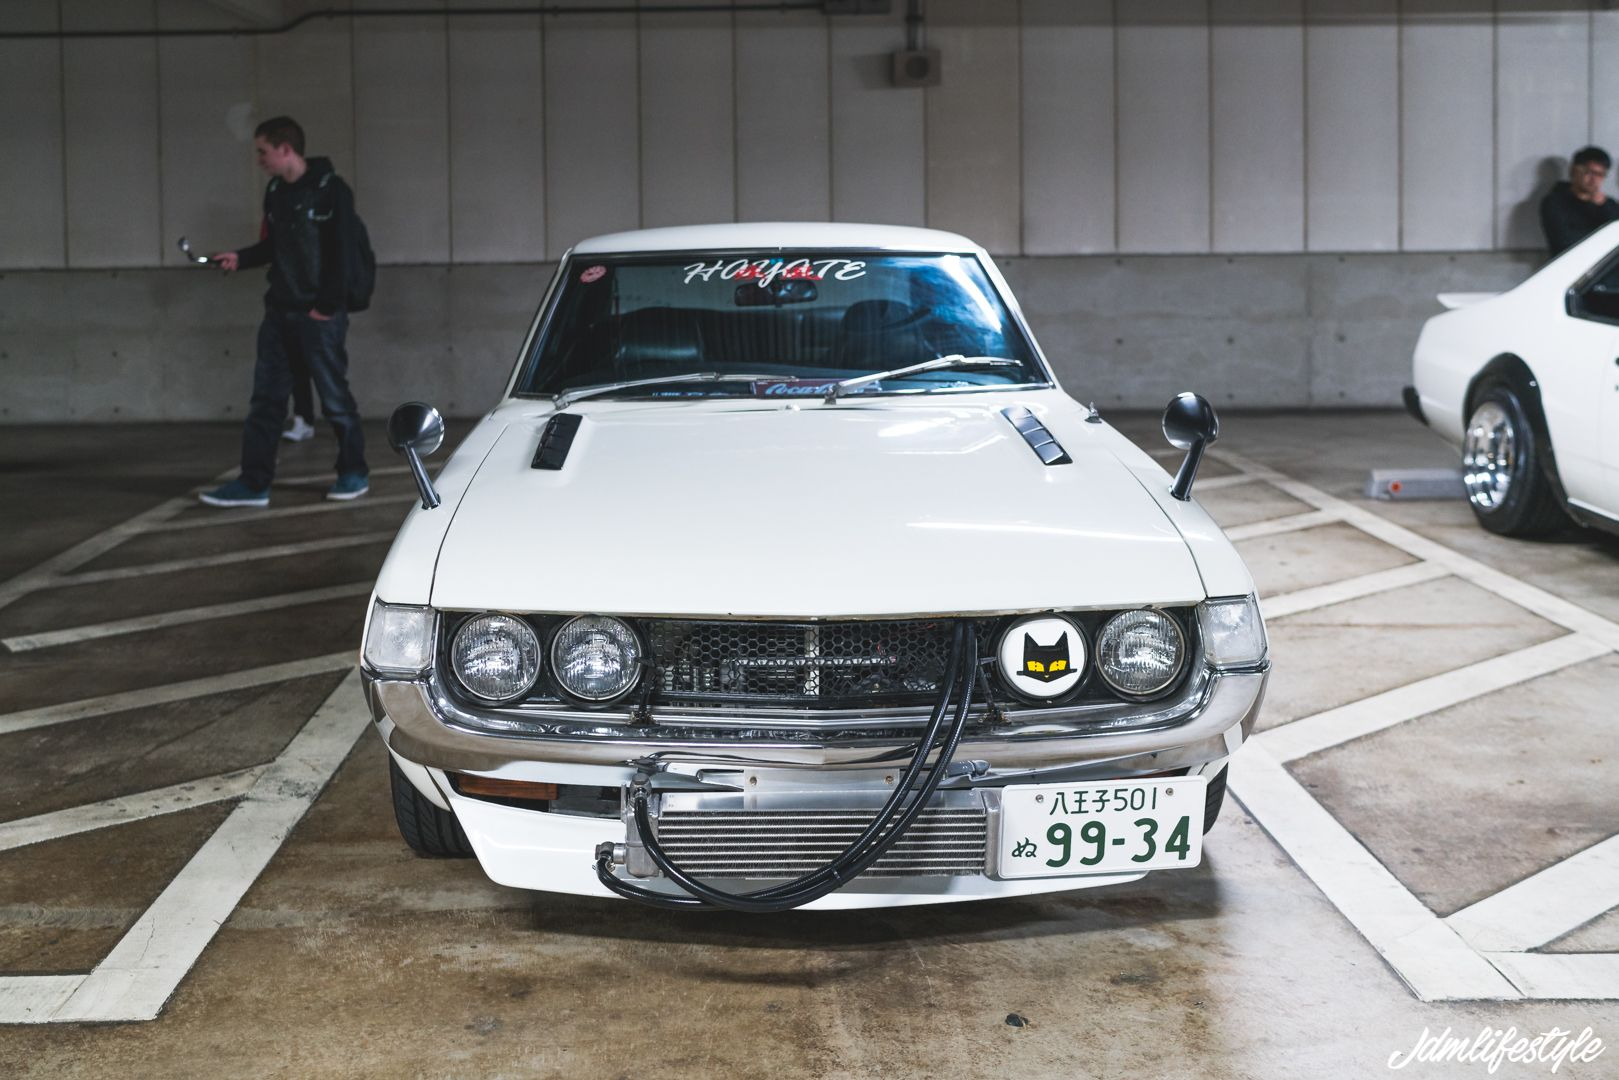 fresh tokyo car meet 17 part 1 jdmlifestyle car tokyo car show pinterest